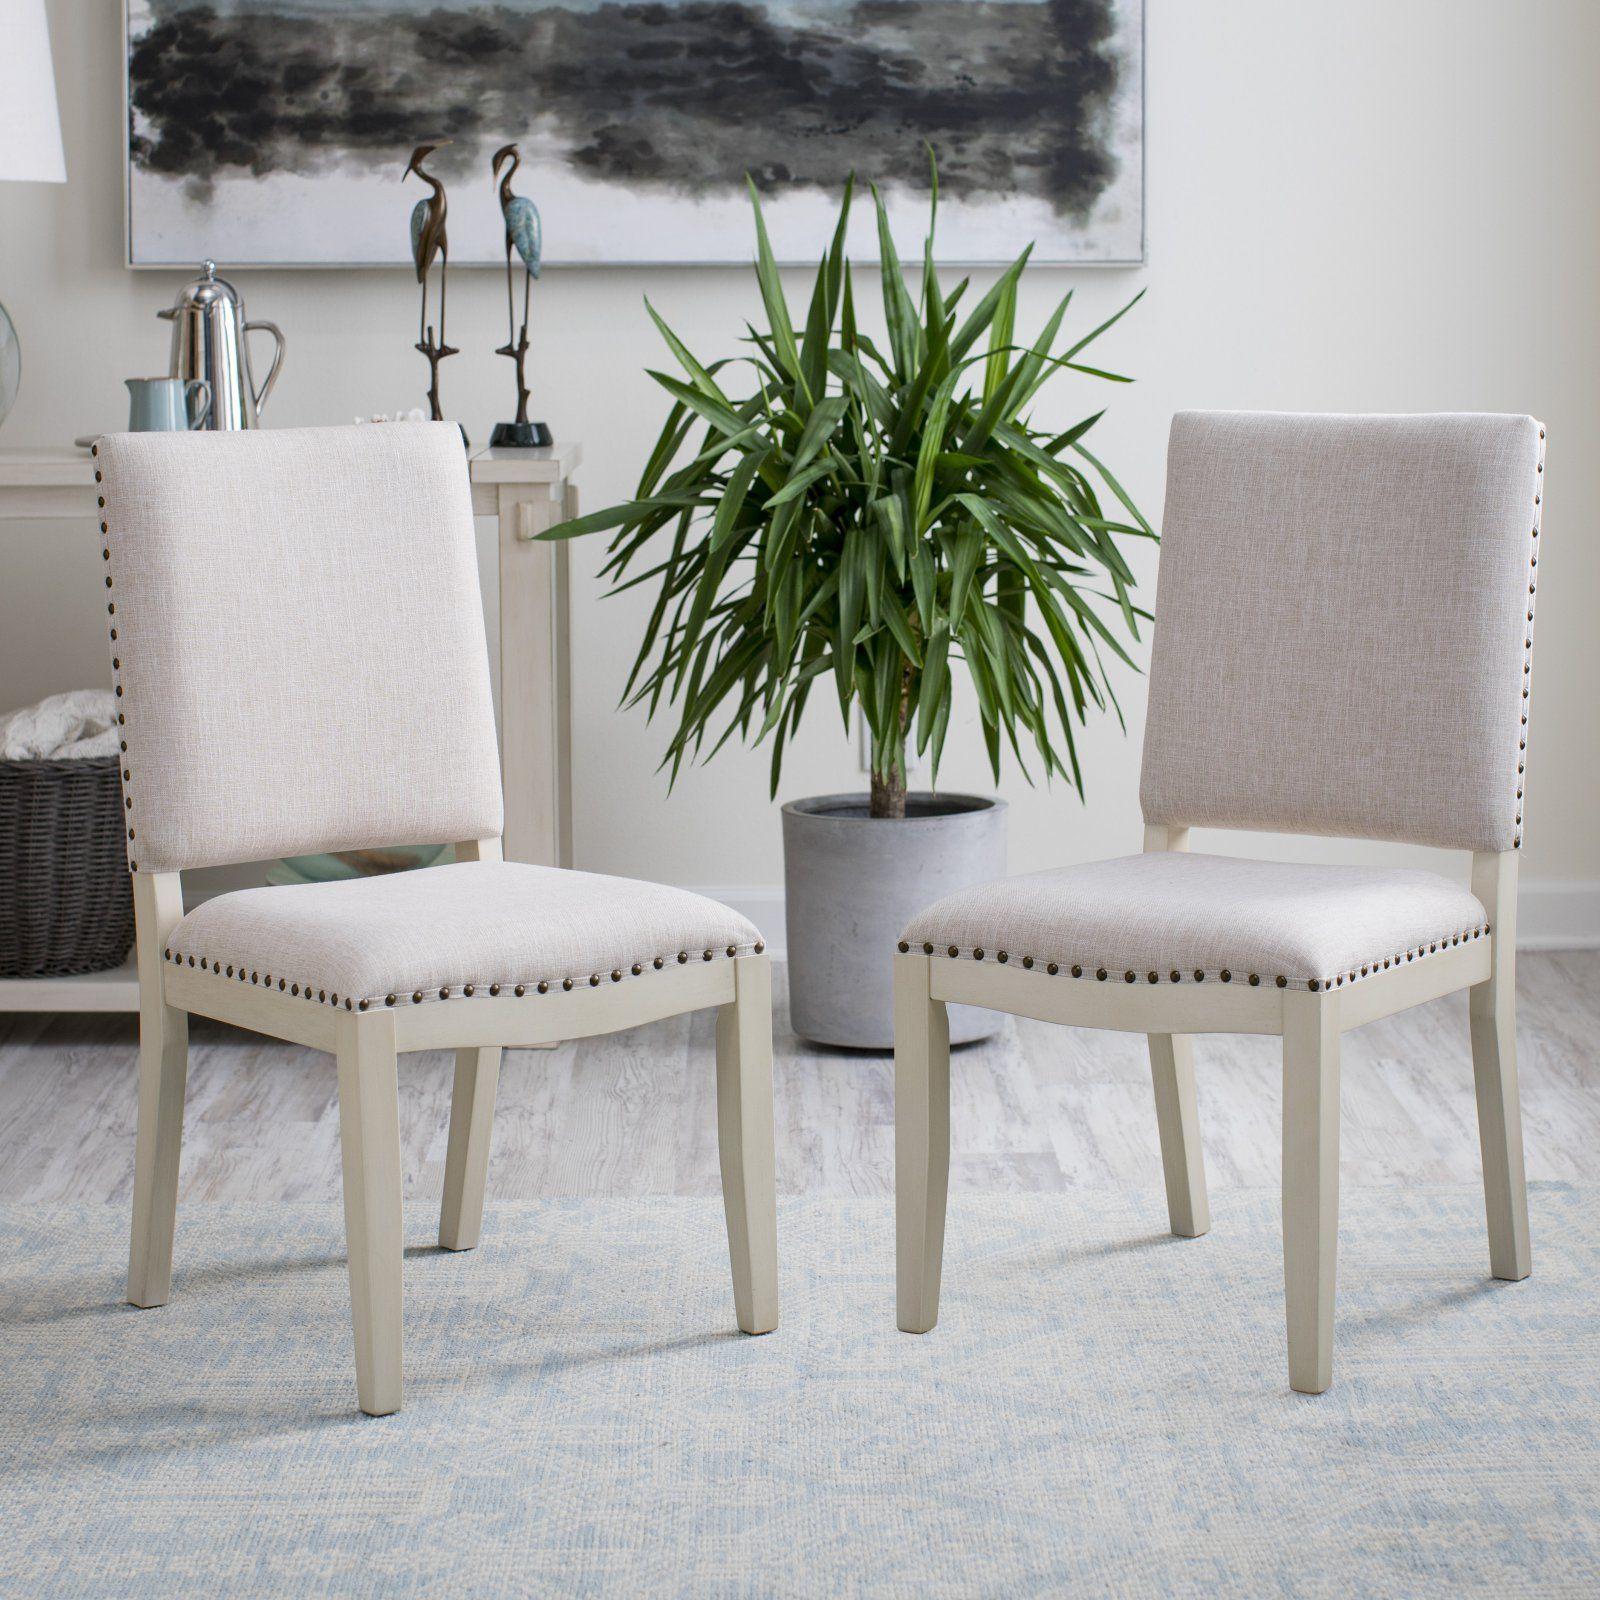 Belham Living Newport Antique White Dining Chair Set Of 2